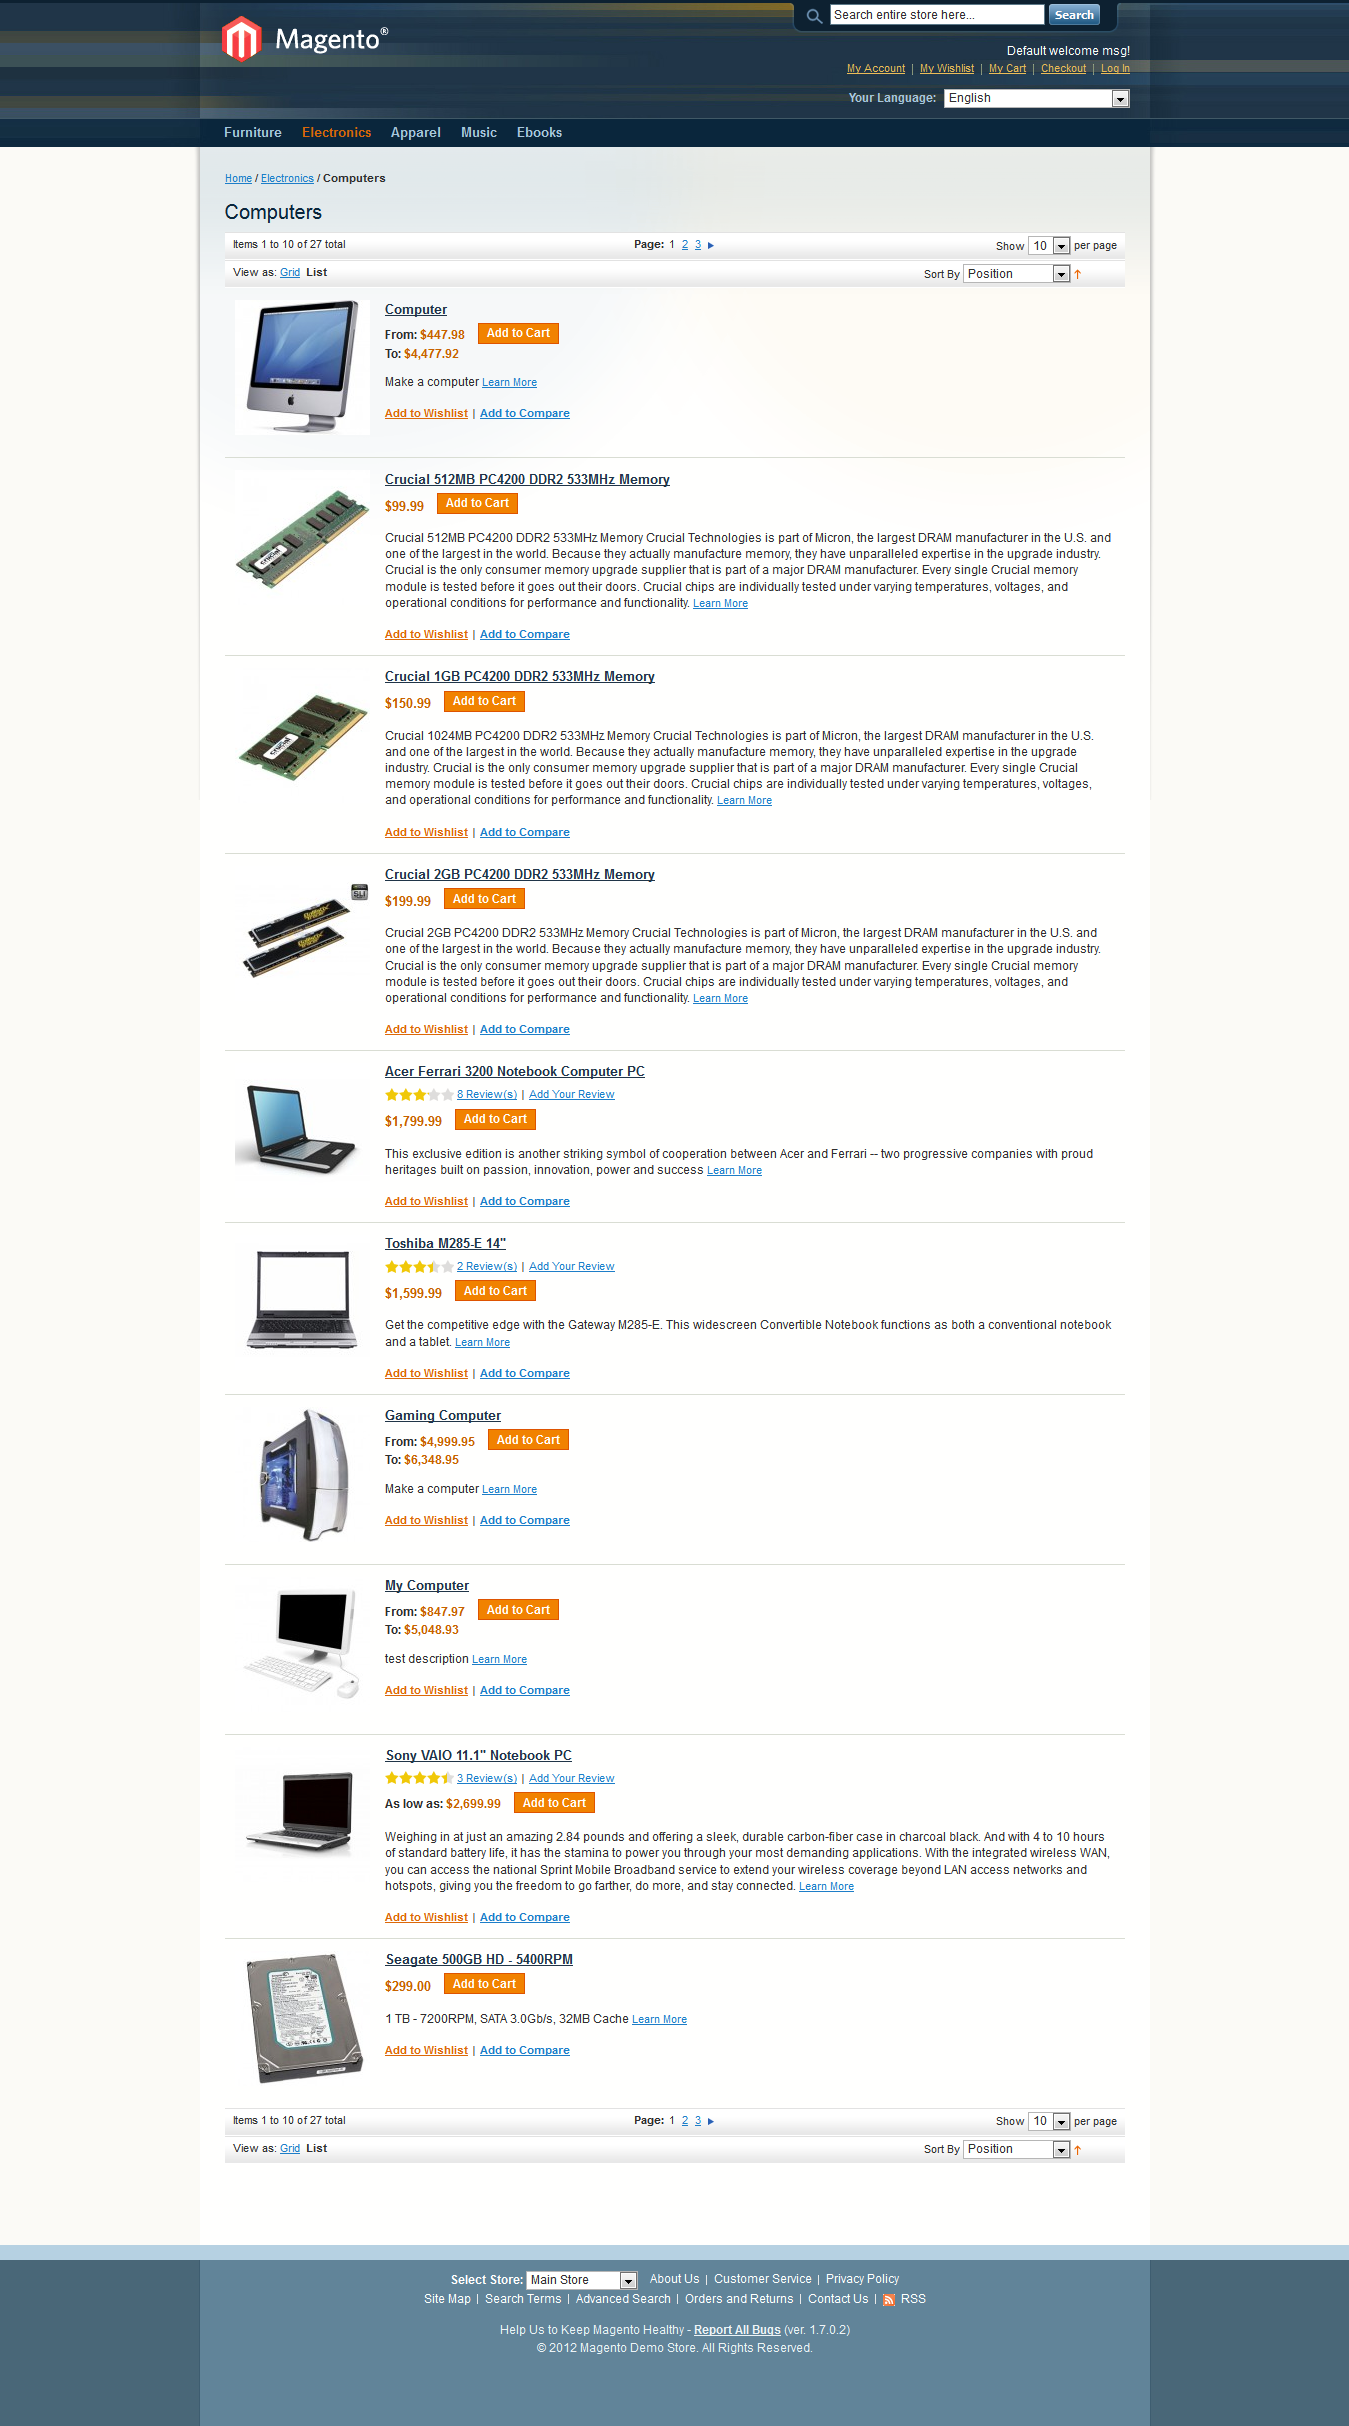 magentocommerce_electronics_computers